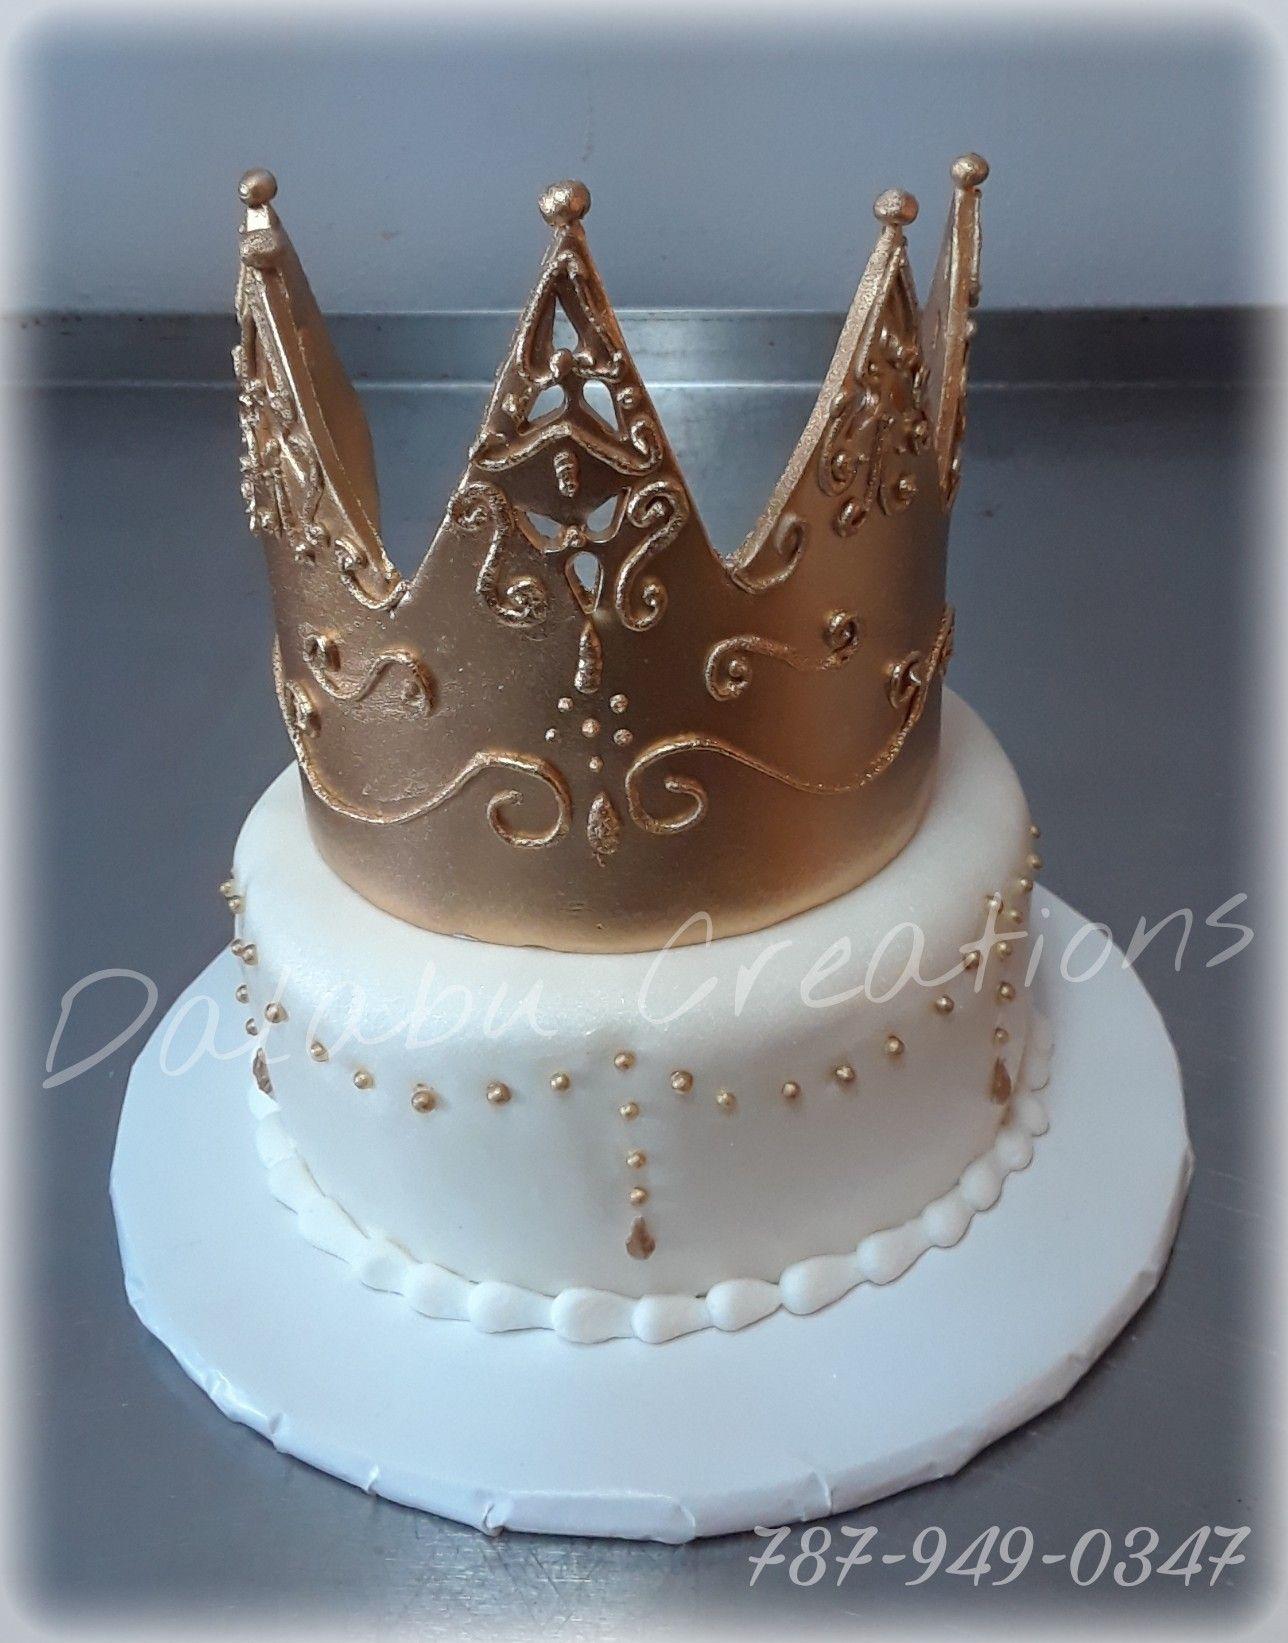 Tiara Cake (www.facebook.com/melonysdelightfulcakes (With